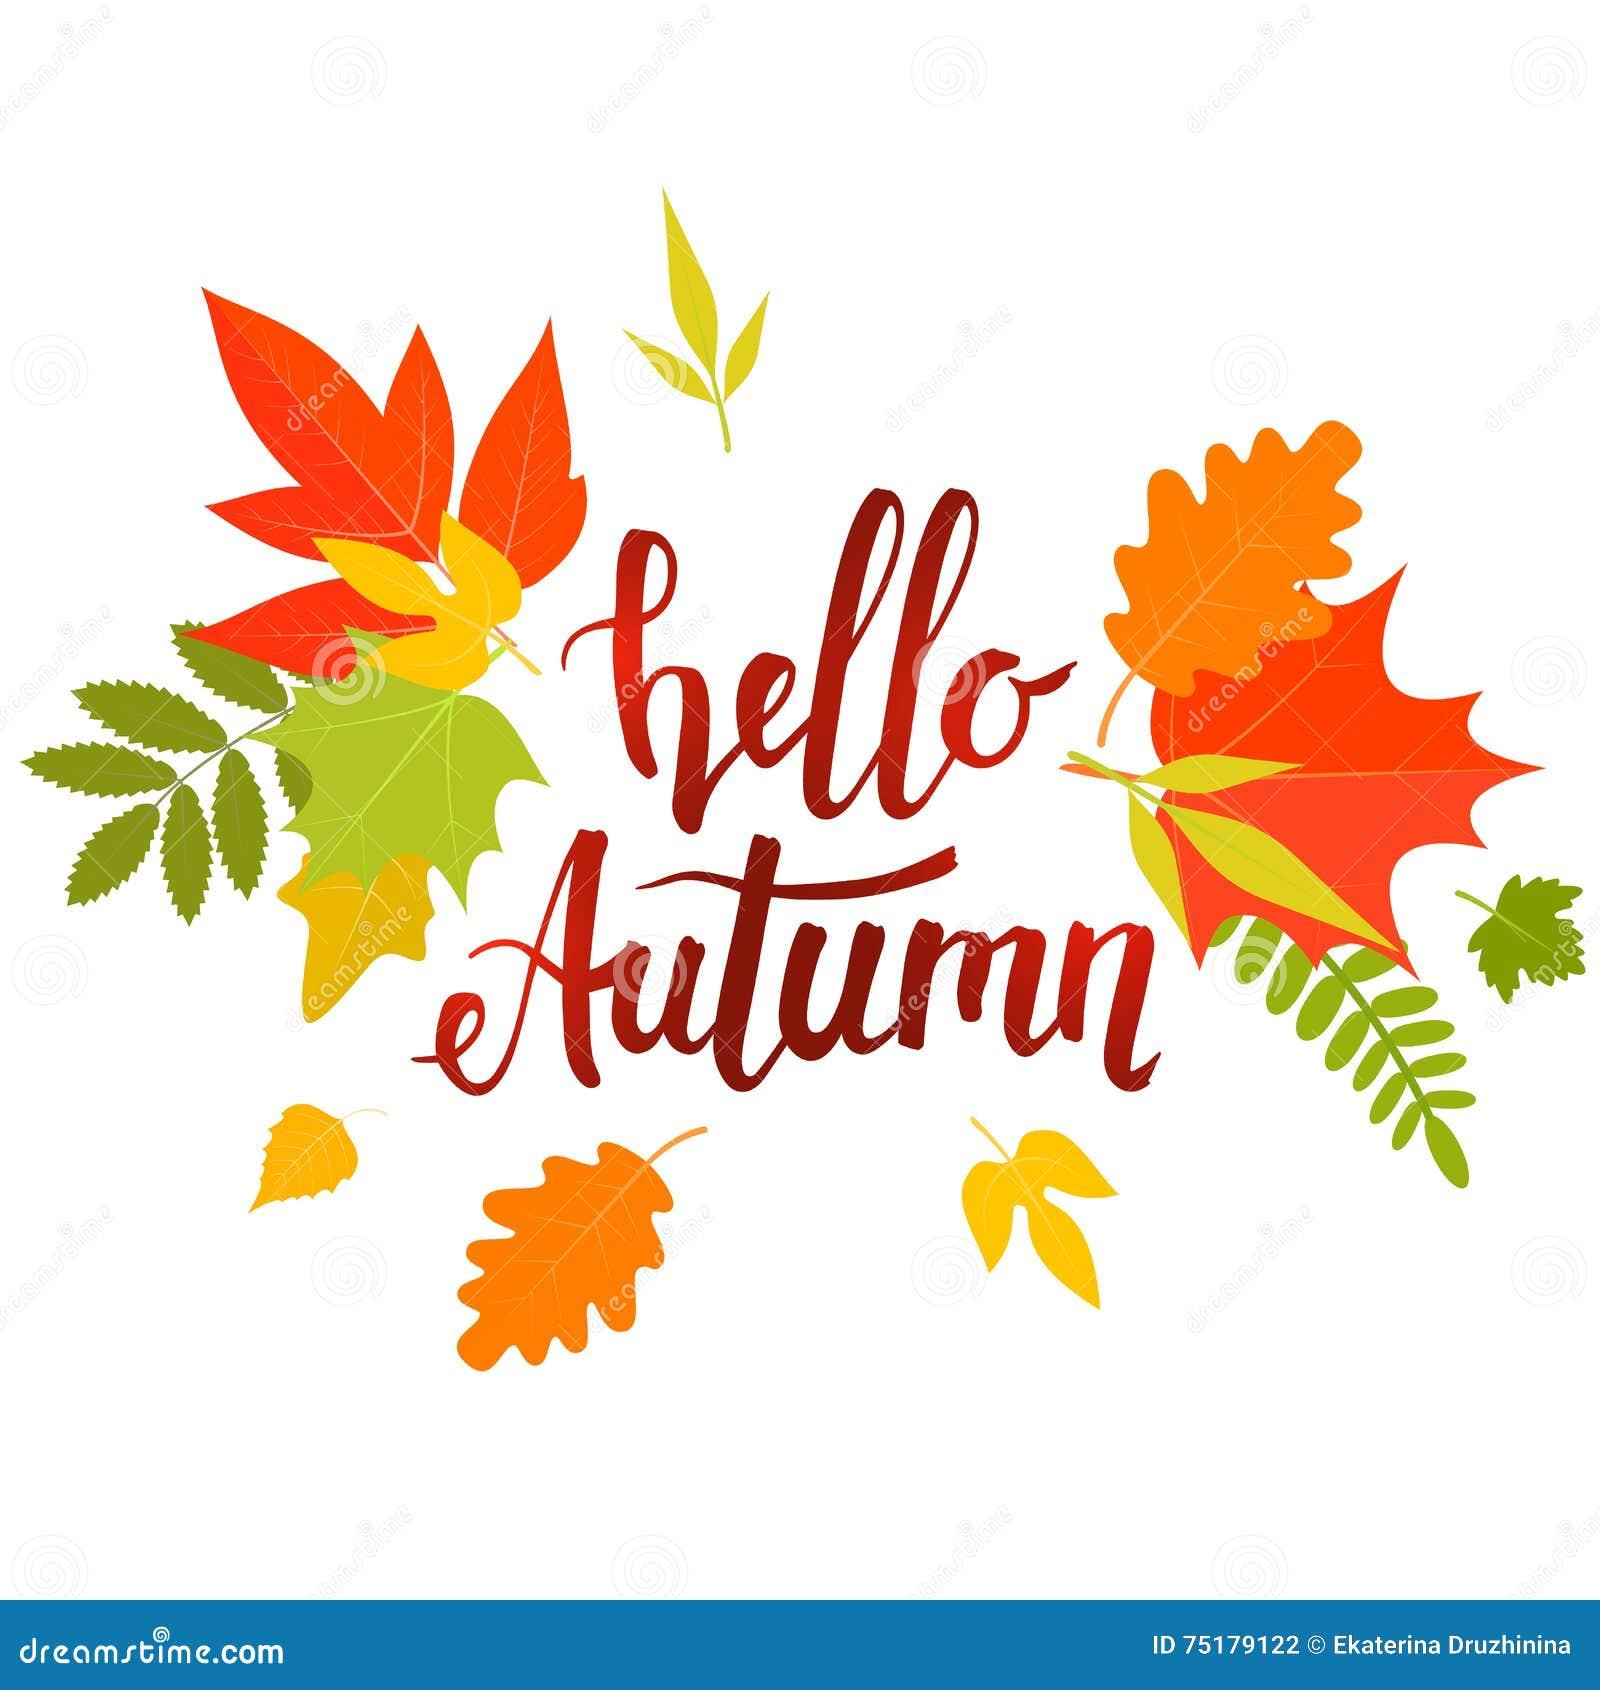 Hello Autumn Lettering Stock Vector - Image: 75179122